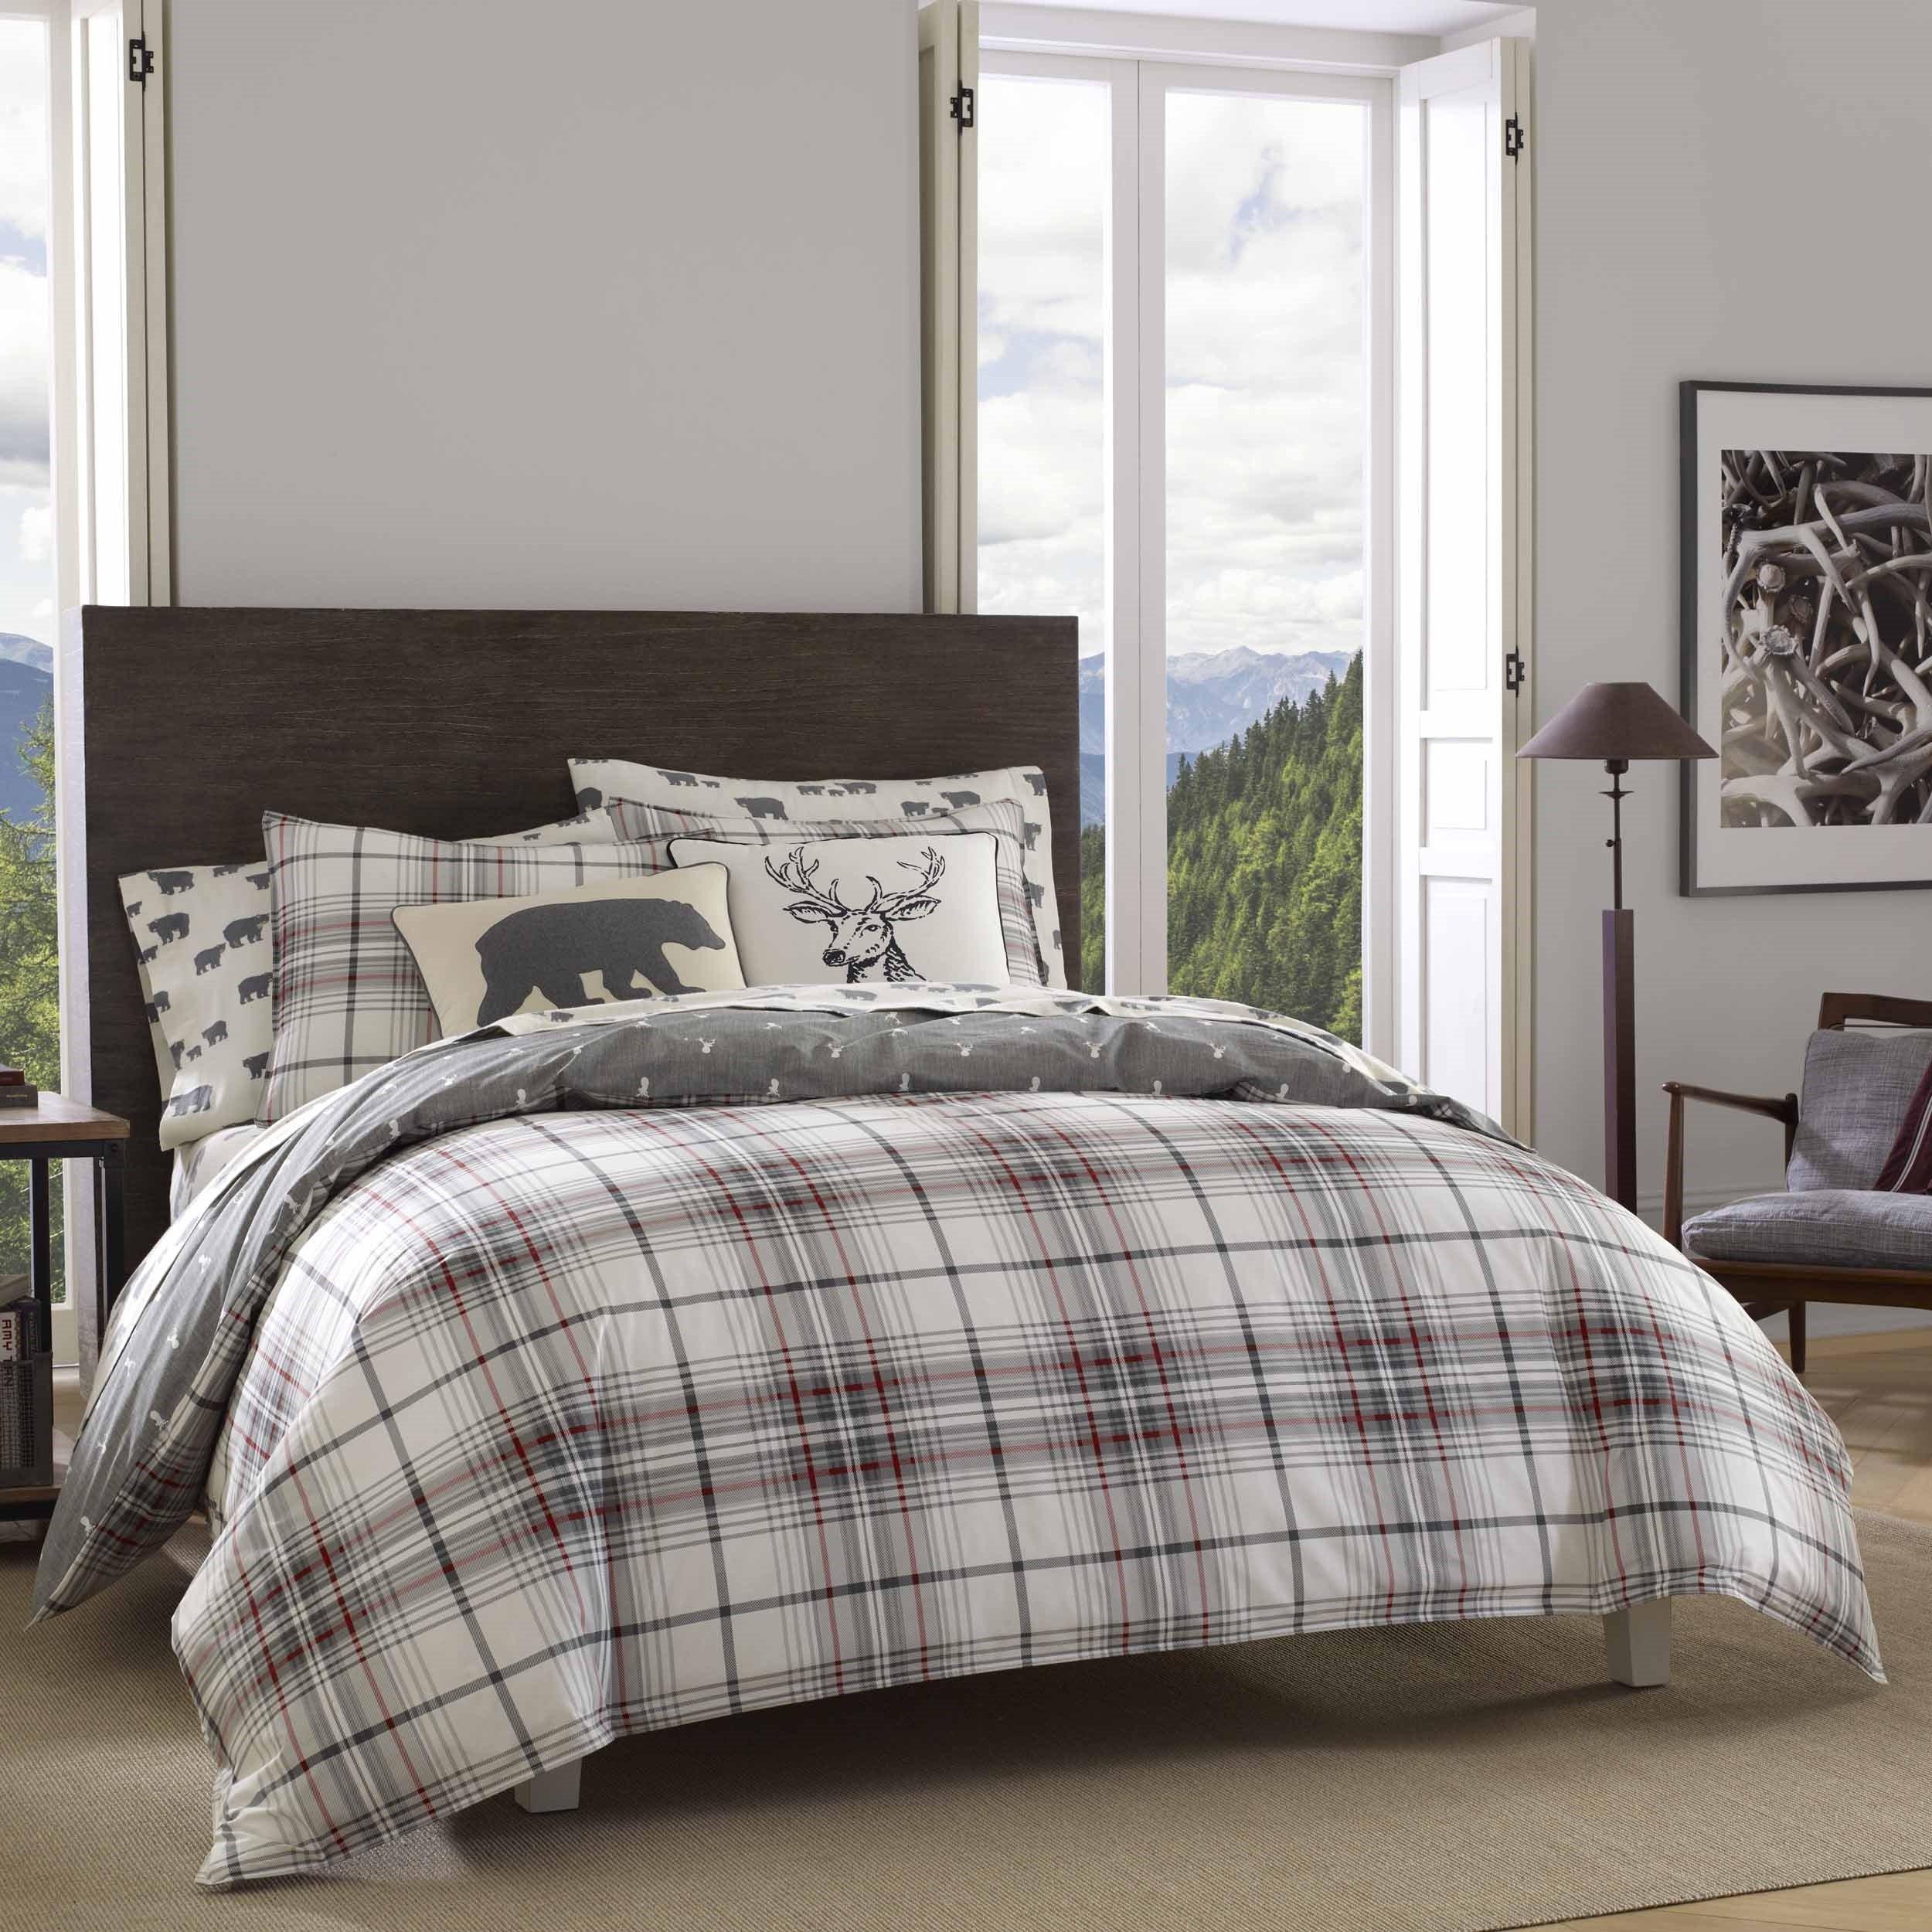 Eddie Bauer Alder Plaid Comforter Set, Full/Queen, Charcoal